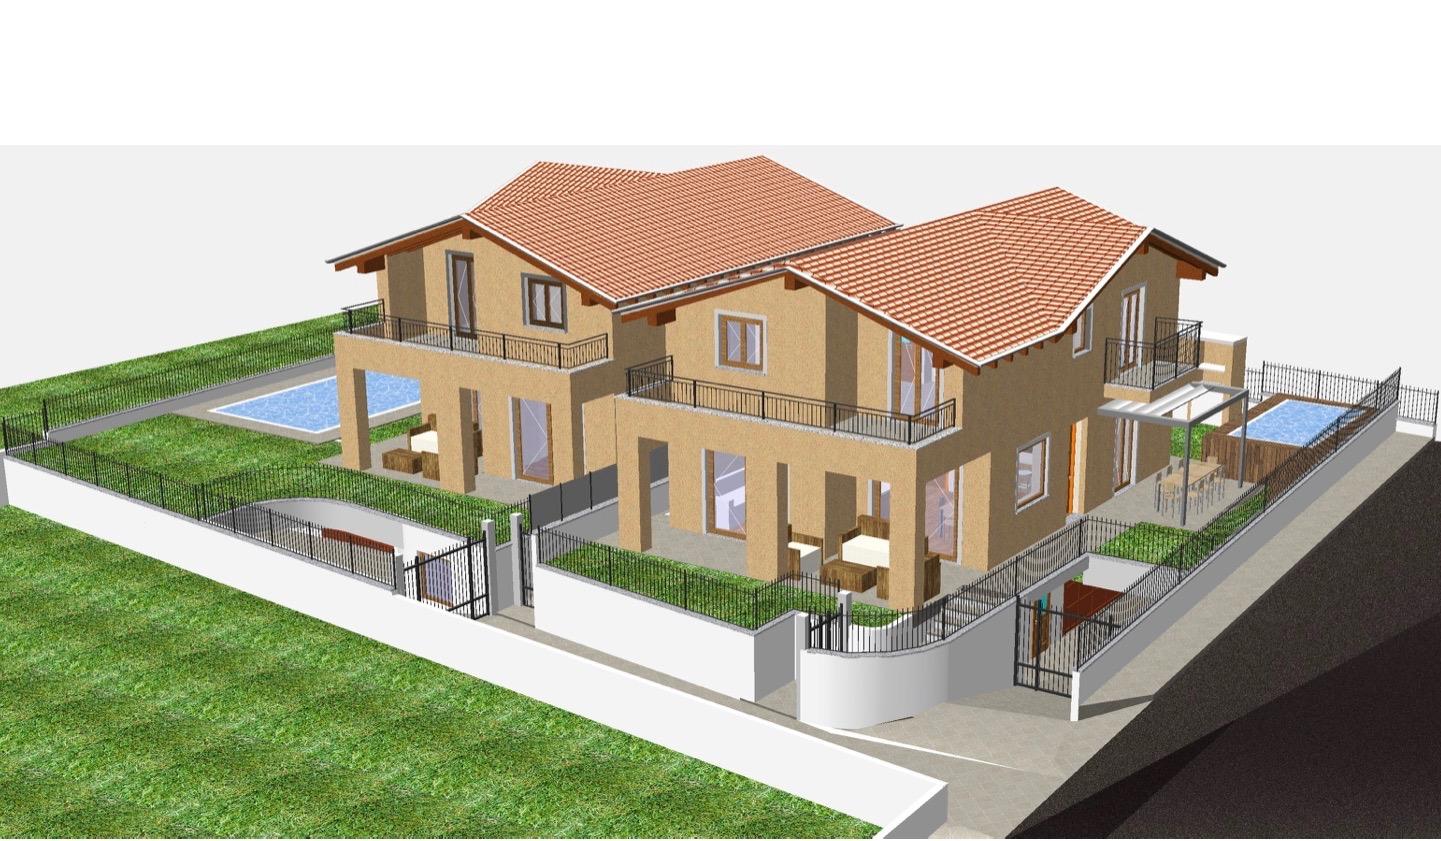 Dongo ville indipendenti con giardino privato e garage for Rendering giardino